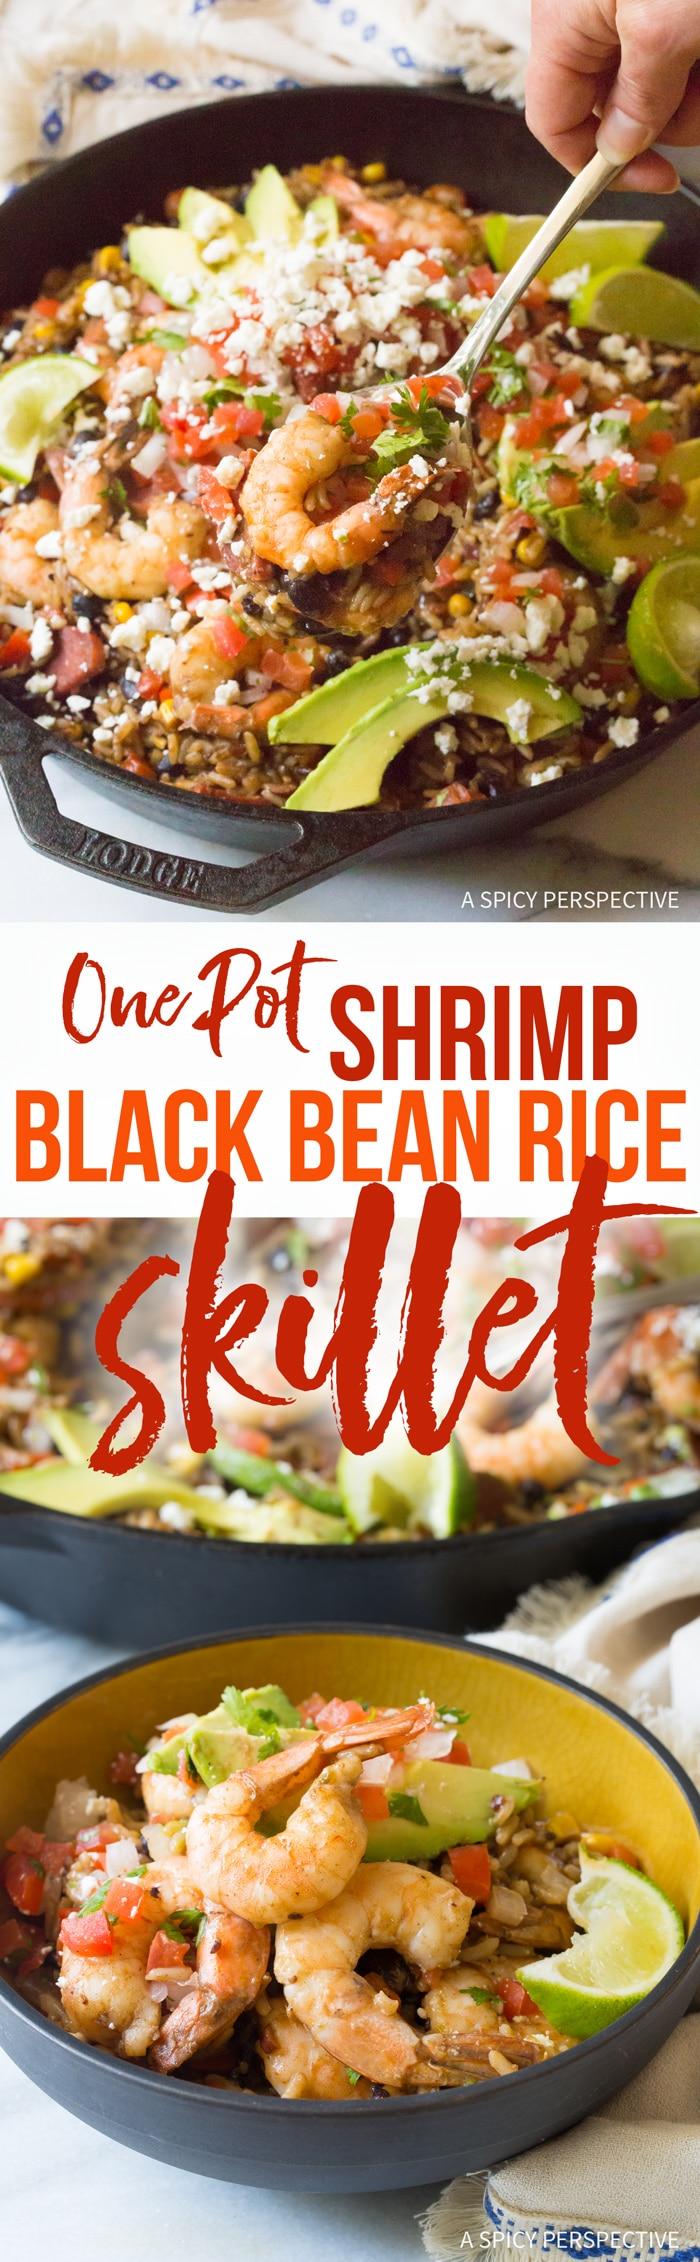 Amazing One-Pot Shrimp Black Bean Rice Skillet Recipe